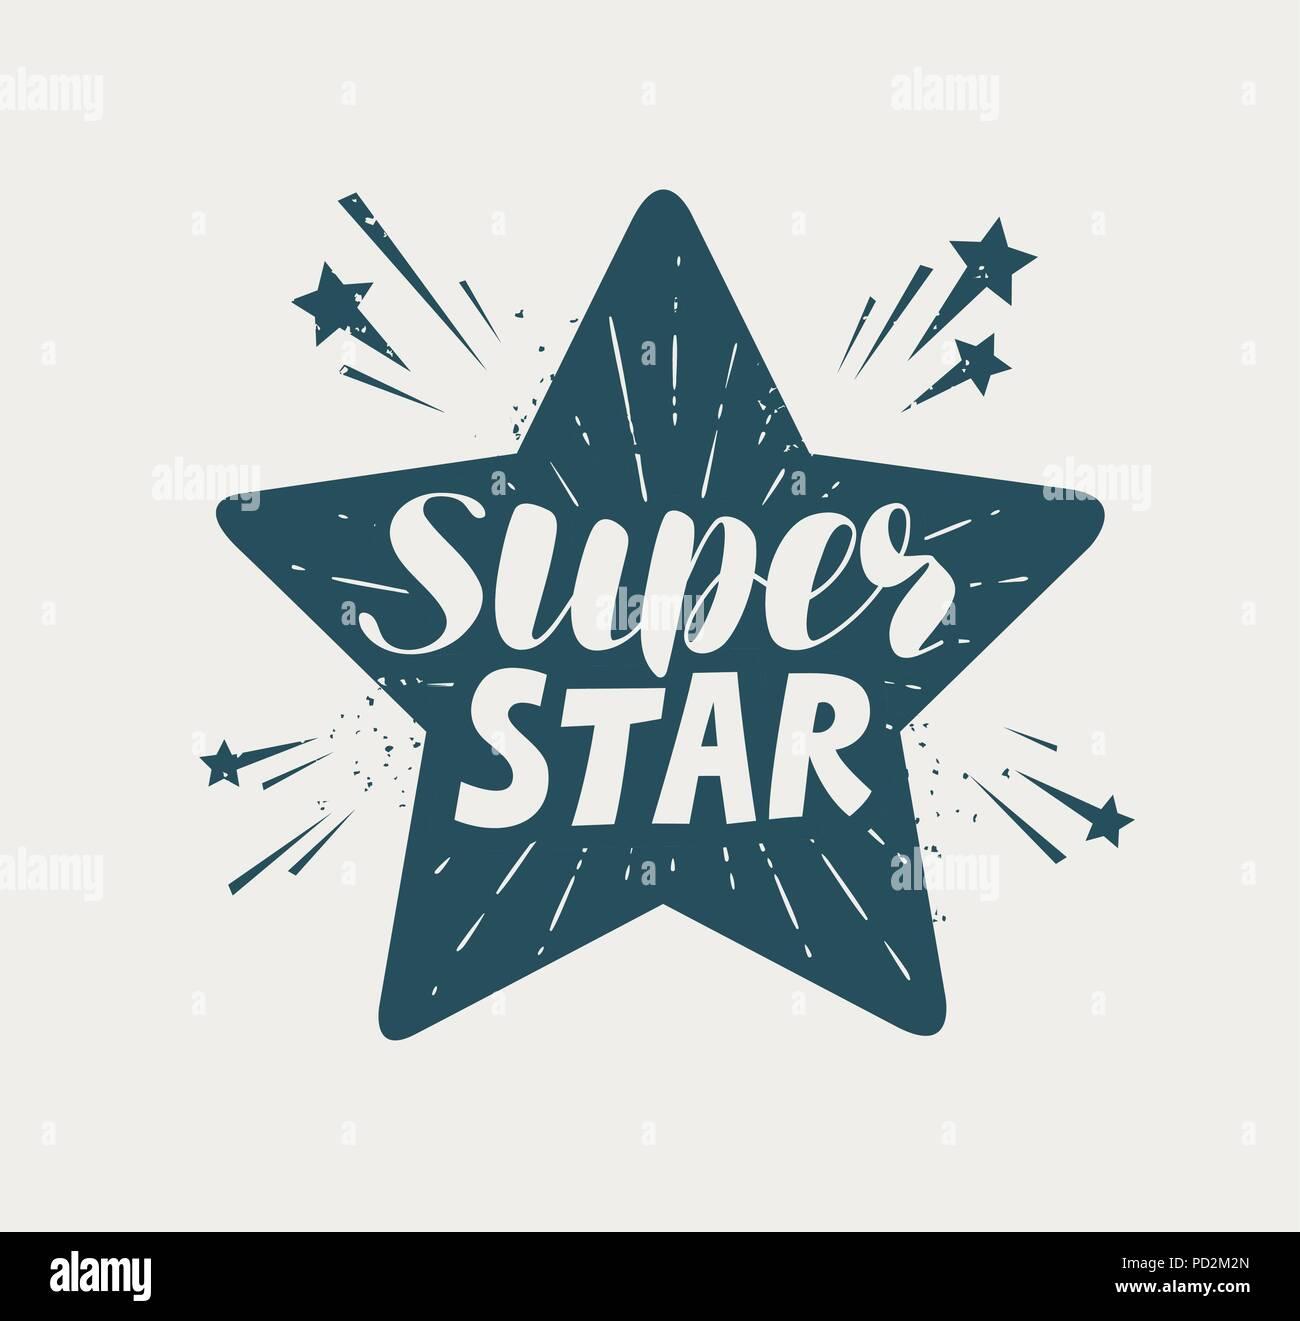 Super star, typographic design. Lettering vector illustration - Stock Image